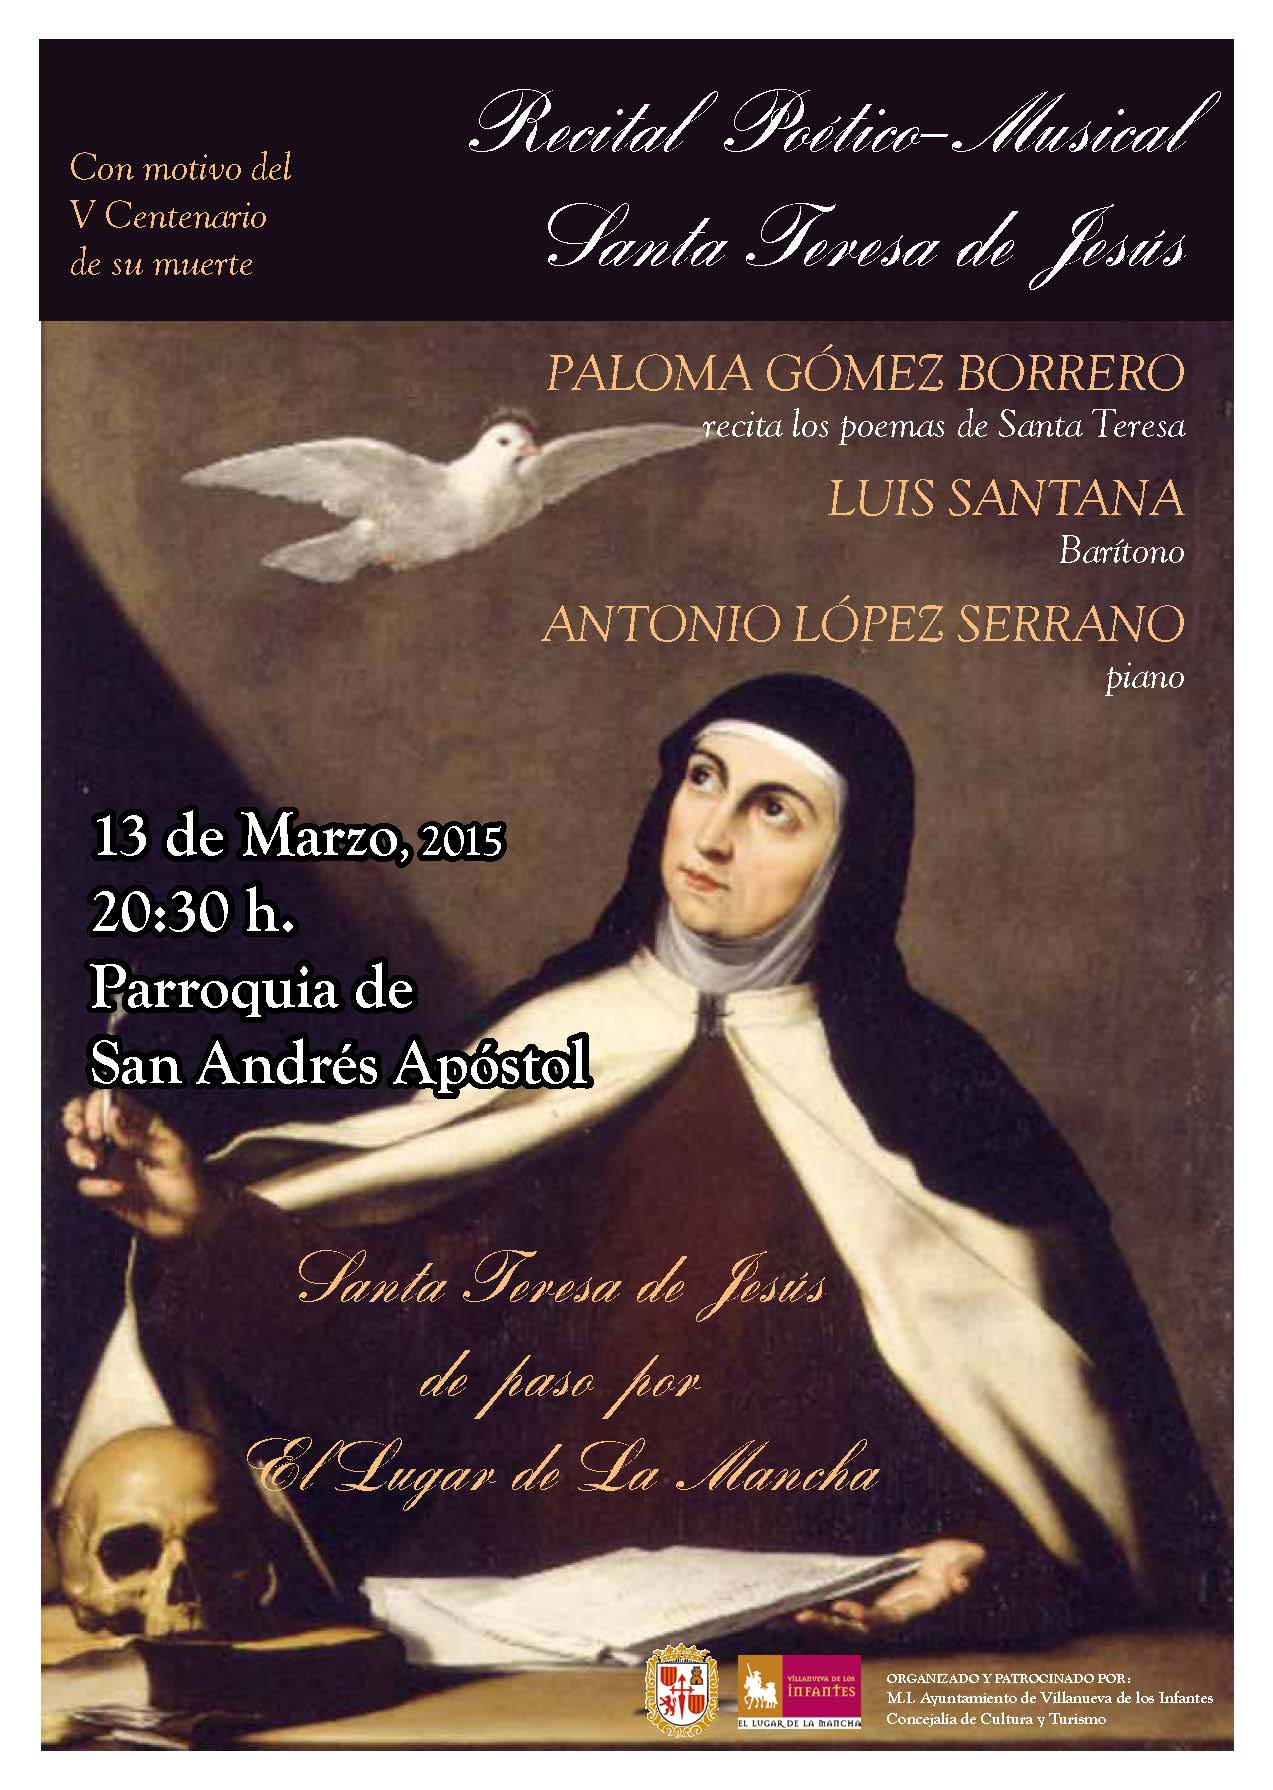 Paloma Gómez Borrero pone voz a Santa Teresa en Villanueva de los Infantes